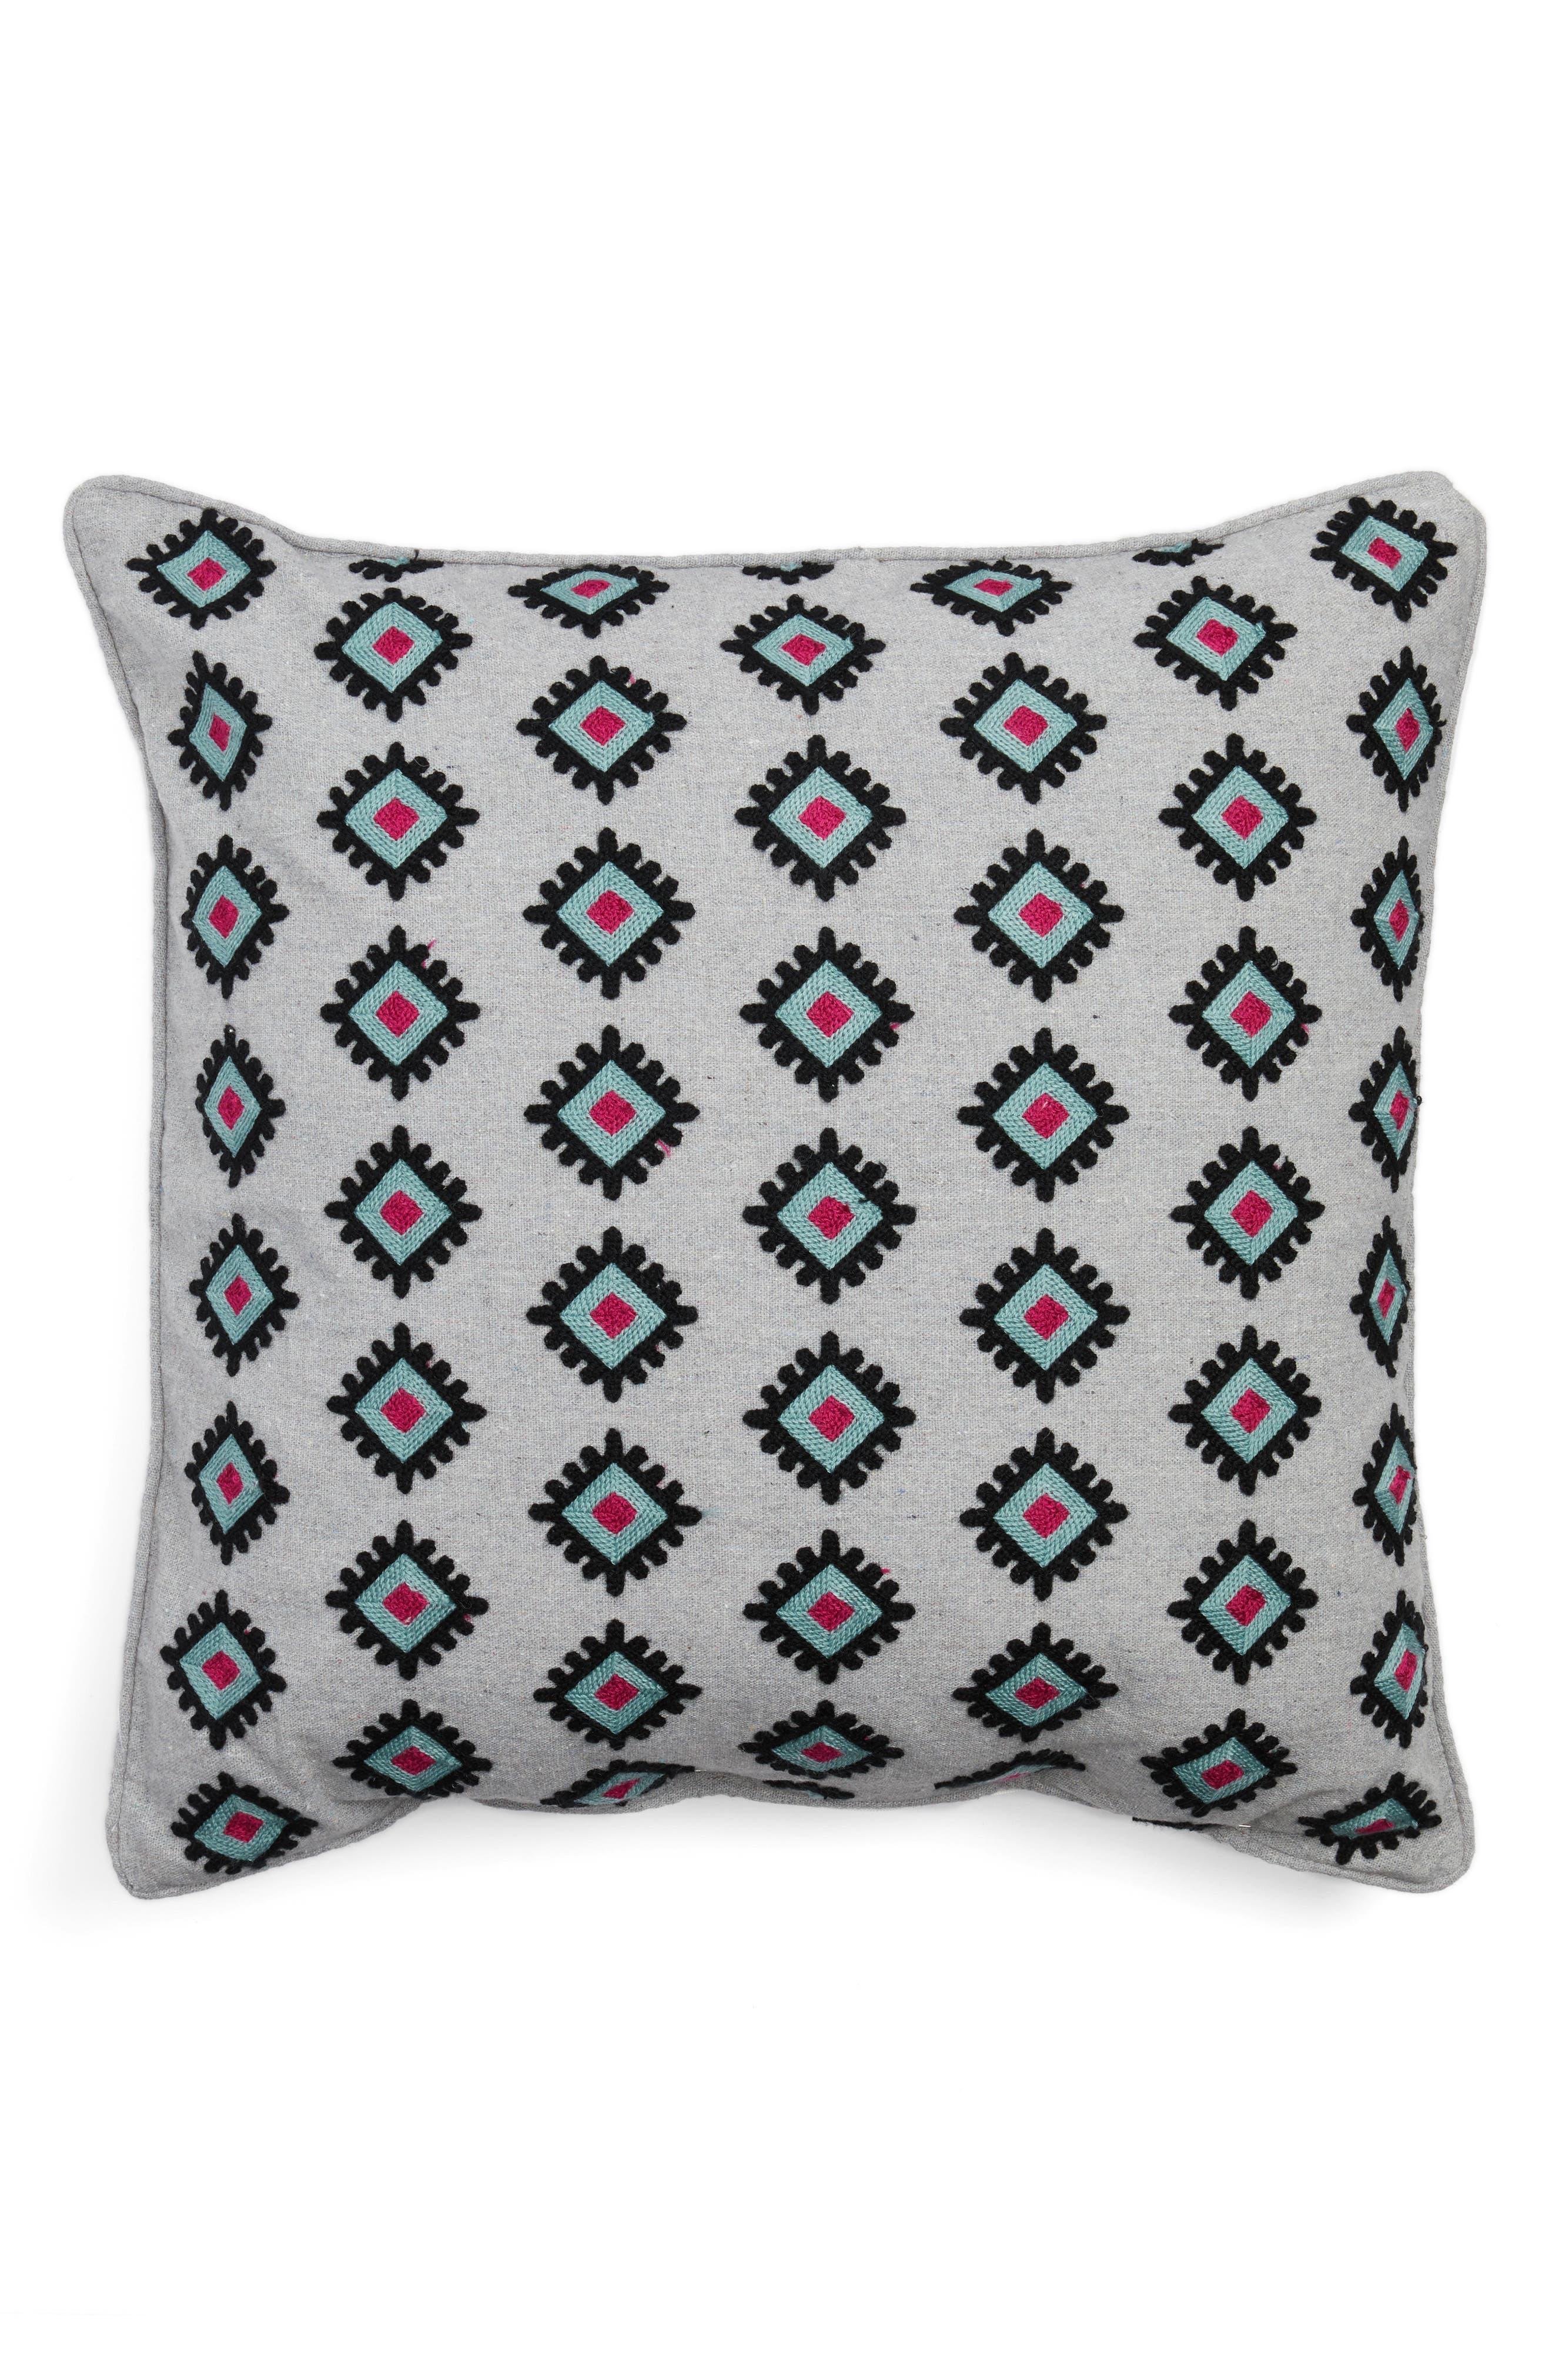 Main Image - Levtex Nala Towel Stitch Accent Pillow